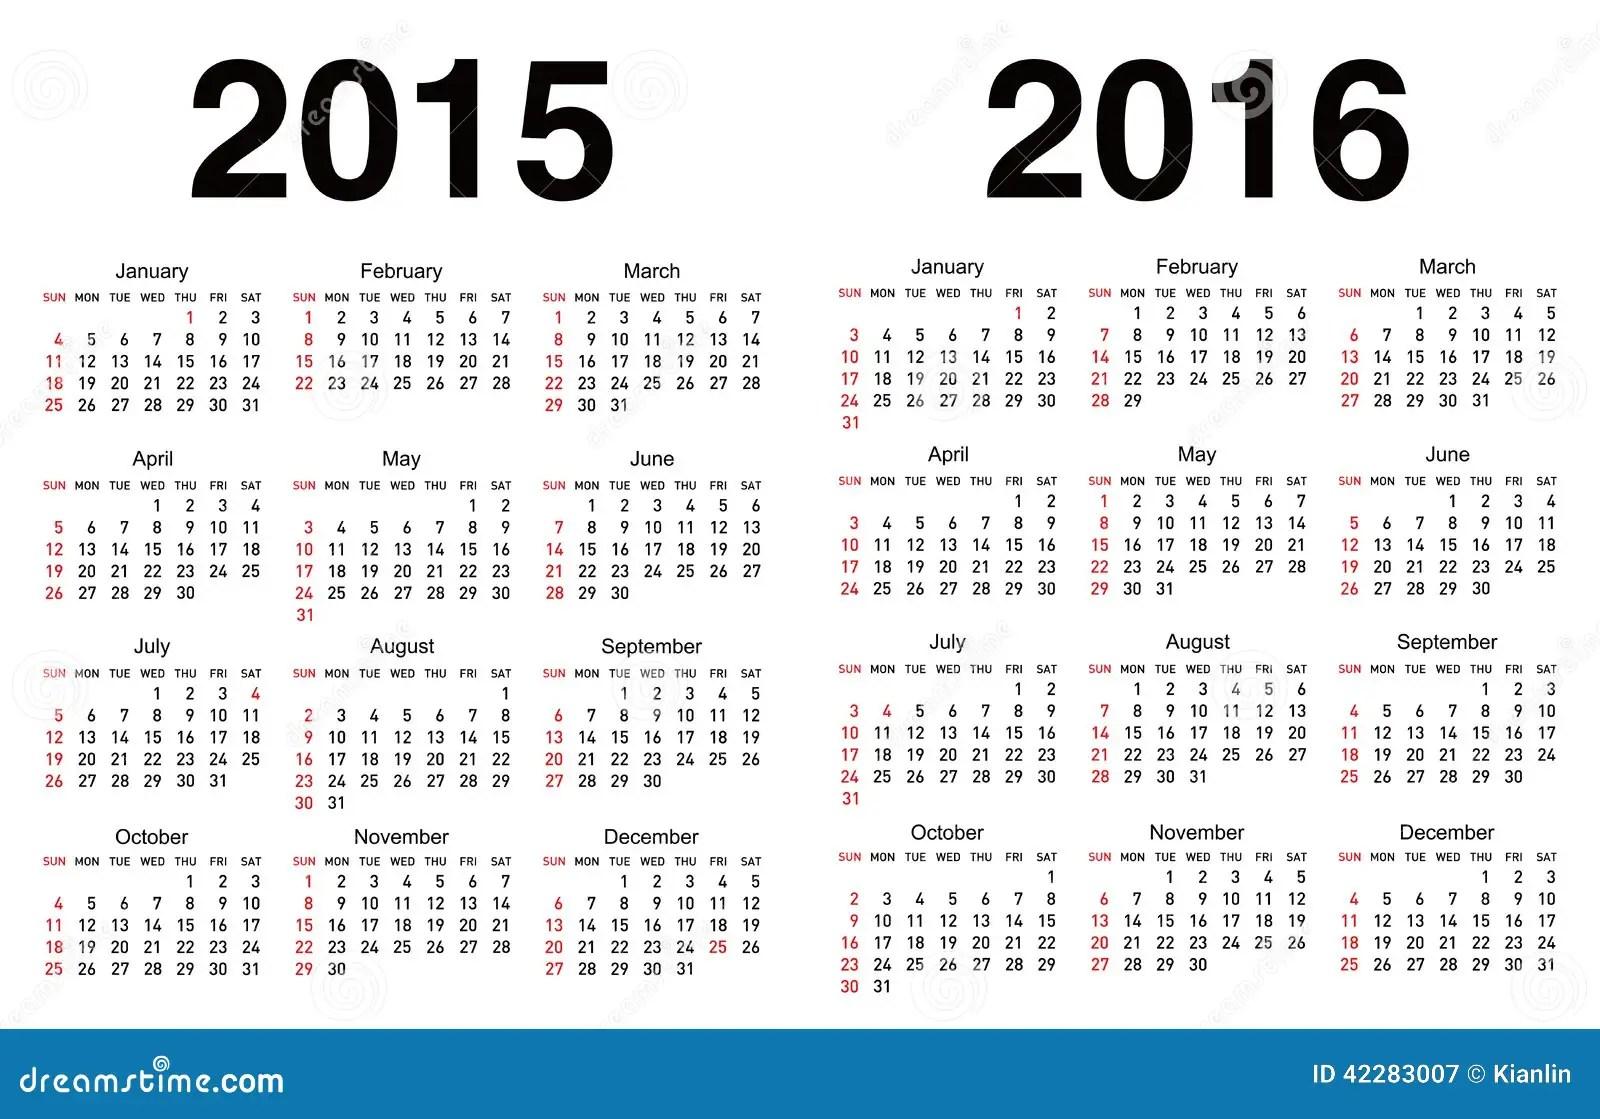 Calendar 2014 Template Illustrator Free Printable Planner Calendar 2014 The Handmade Home Vector Calendar Template Stock Vector Image 42283007